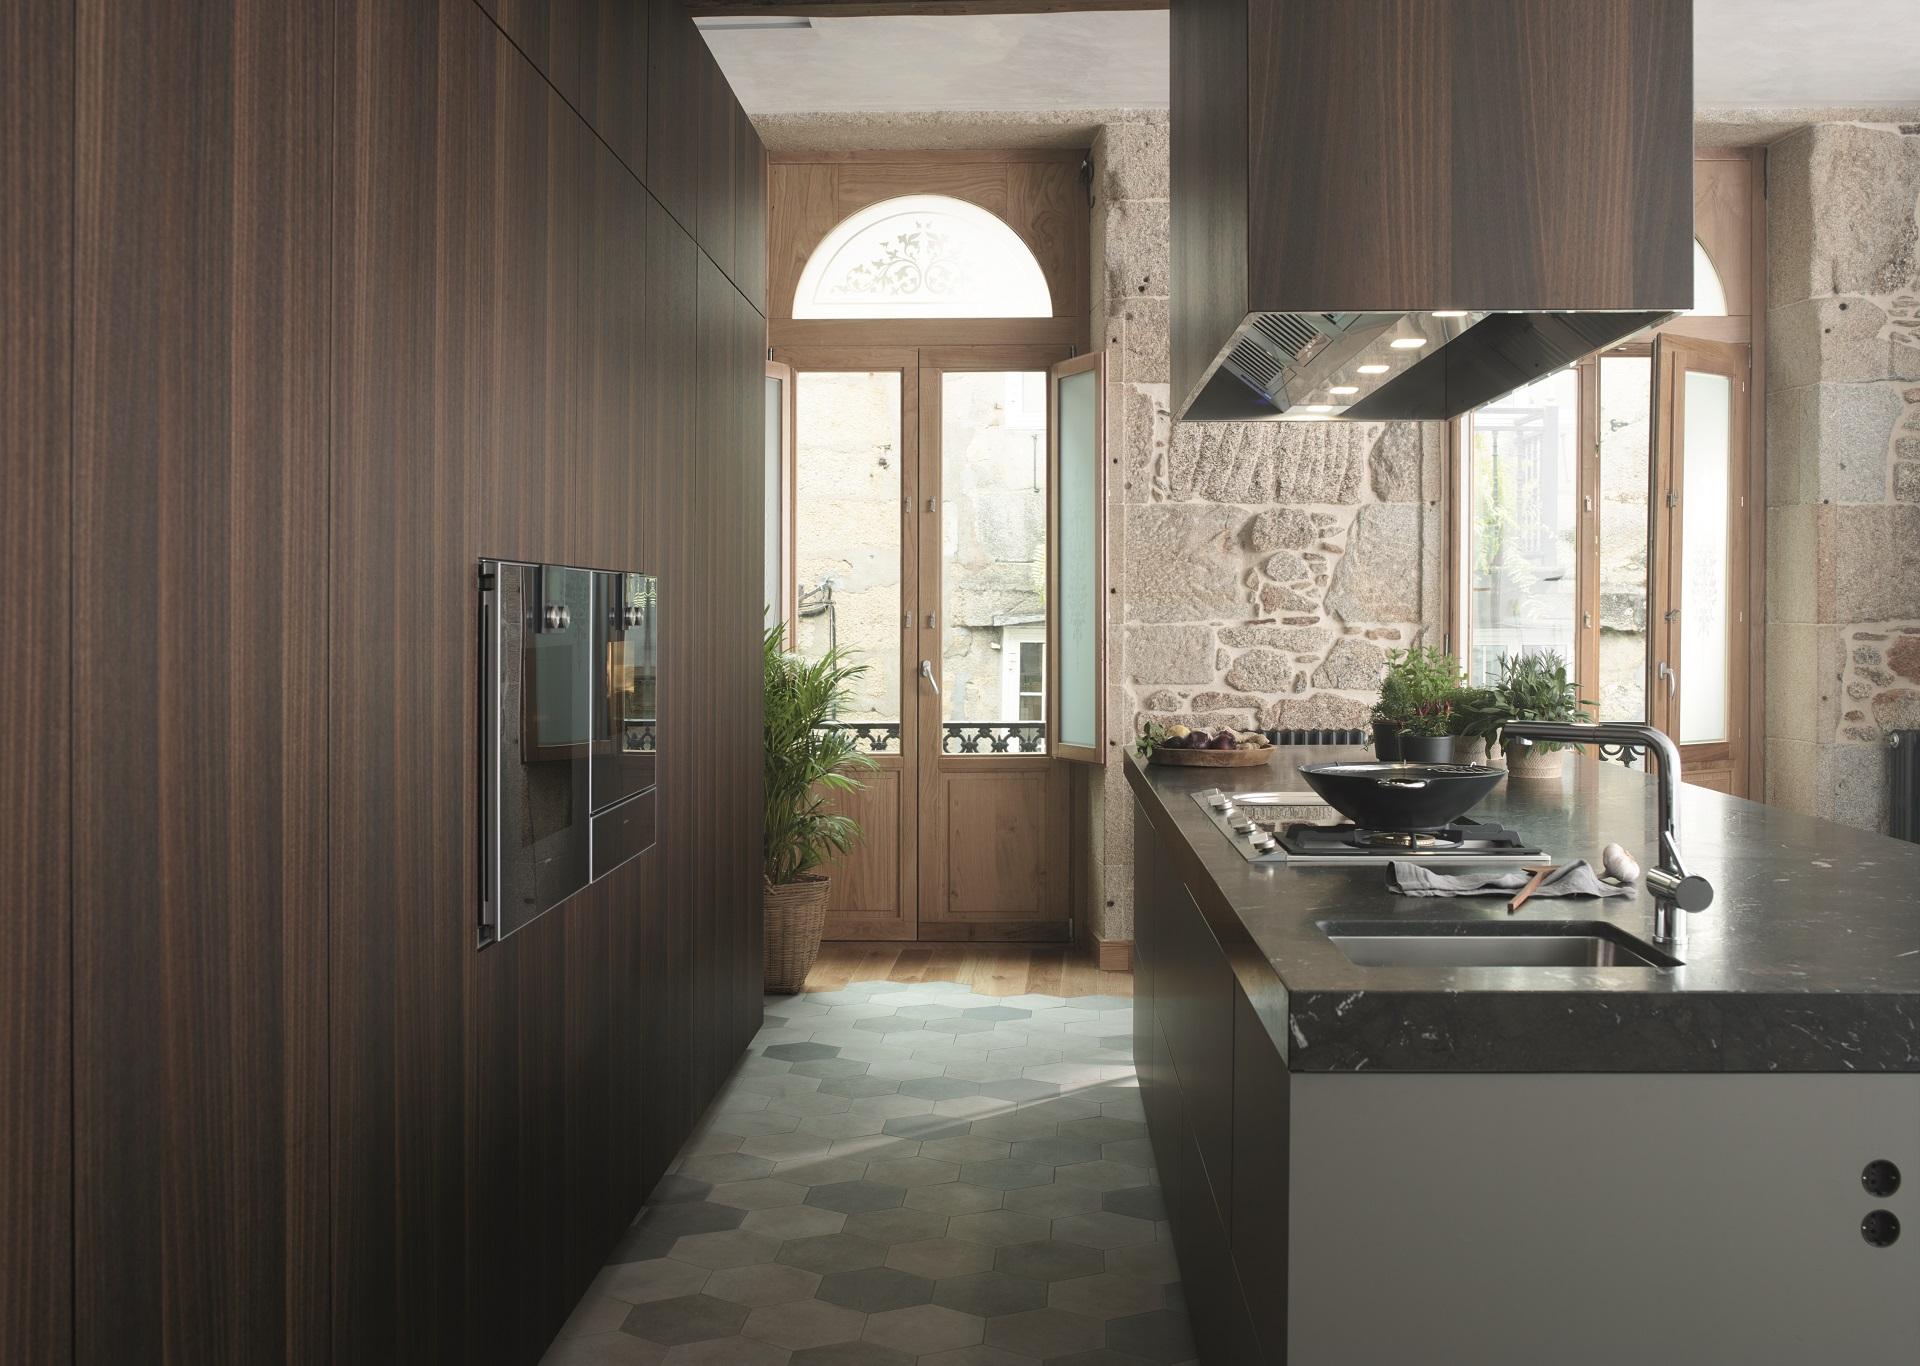 Cocina gris combinada con madera Santos